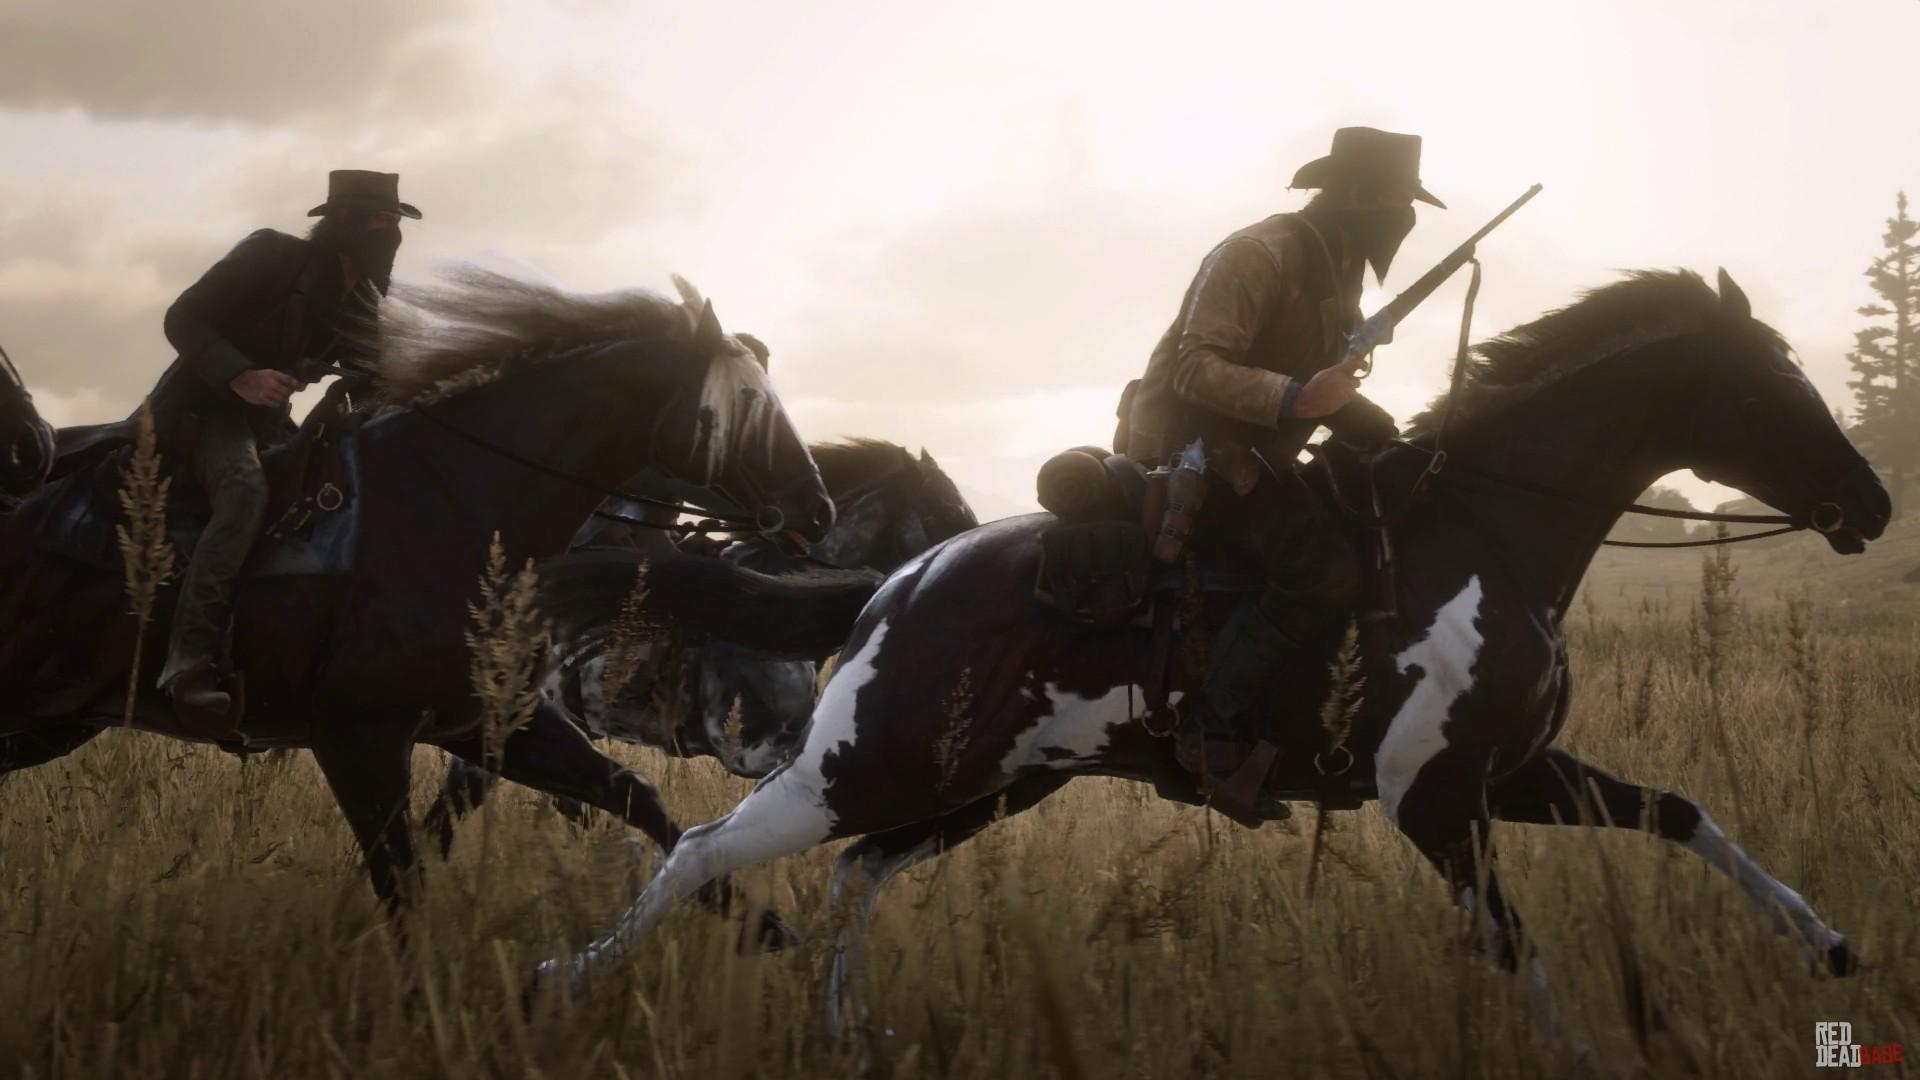 Appaloosa Red Dead Redemption 2 Horse Breeds Guide Red Dead Redemption 2 Animals Species Wildlife Database Red Dead Redemption 2